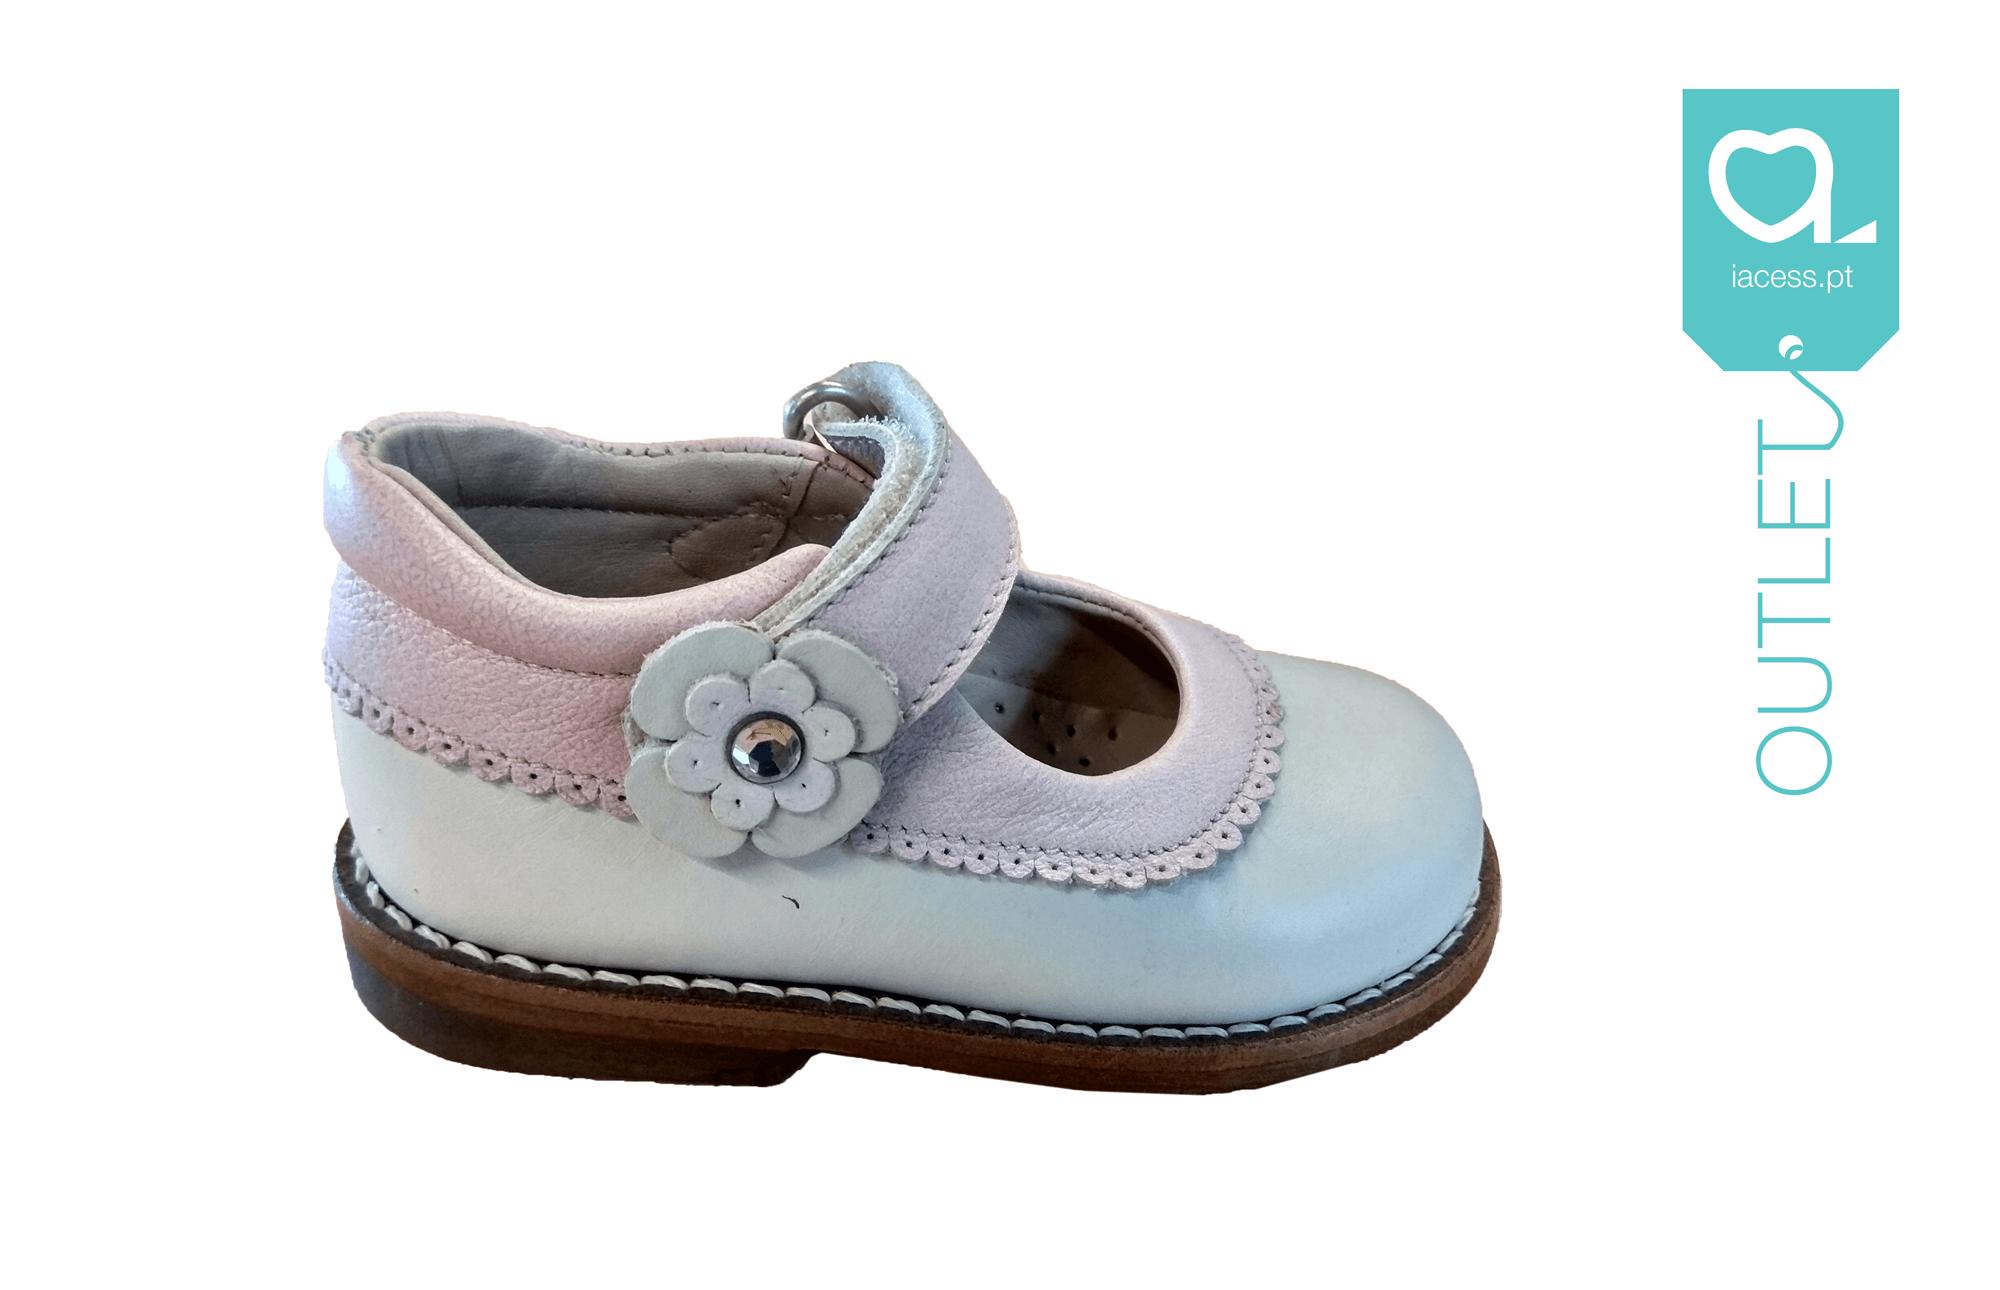 Sapatos ortoppédicos pediátricos